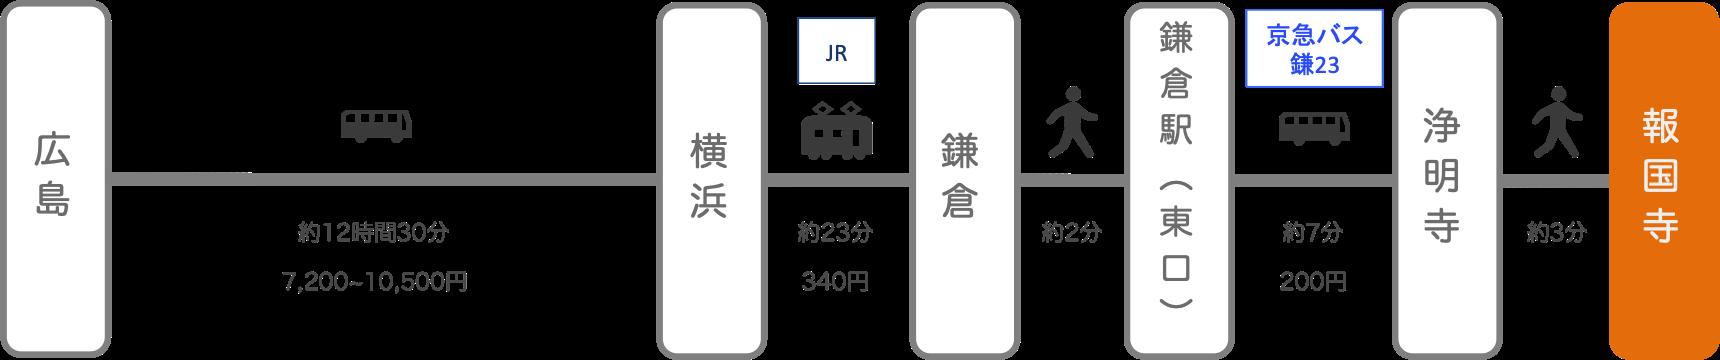 報国寺_広島_高速バス